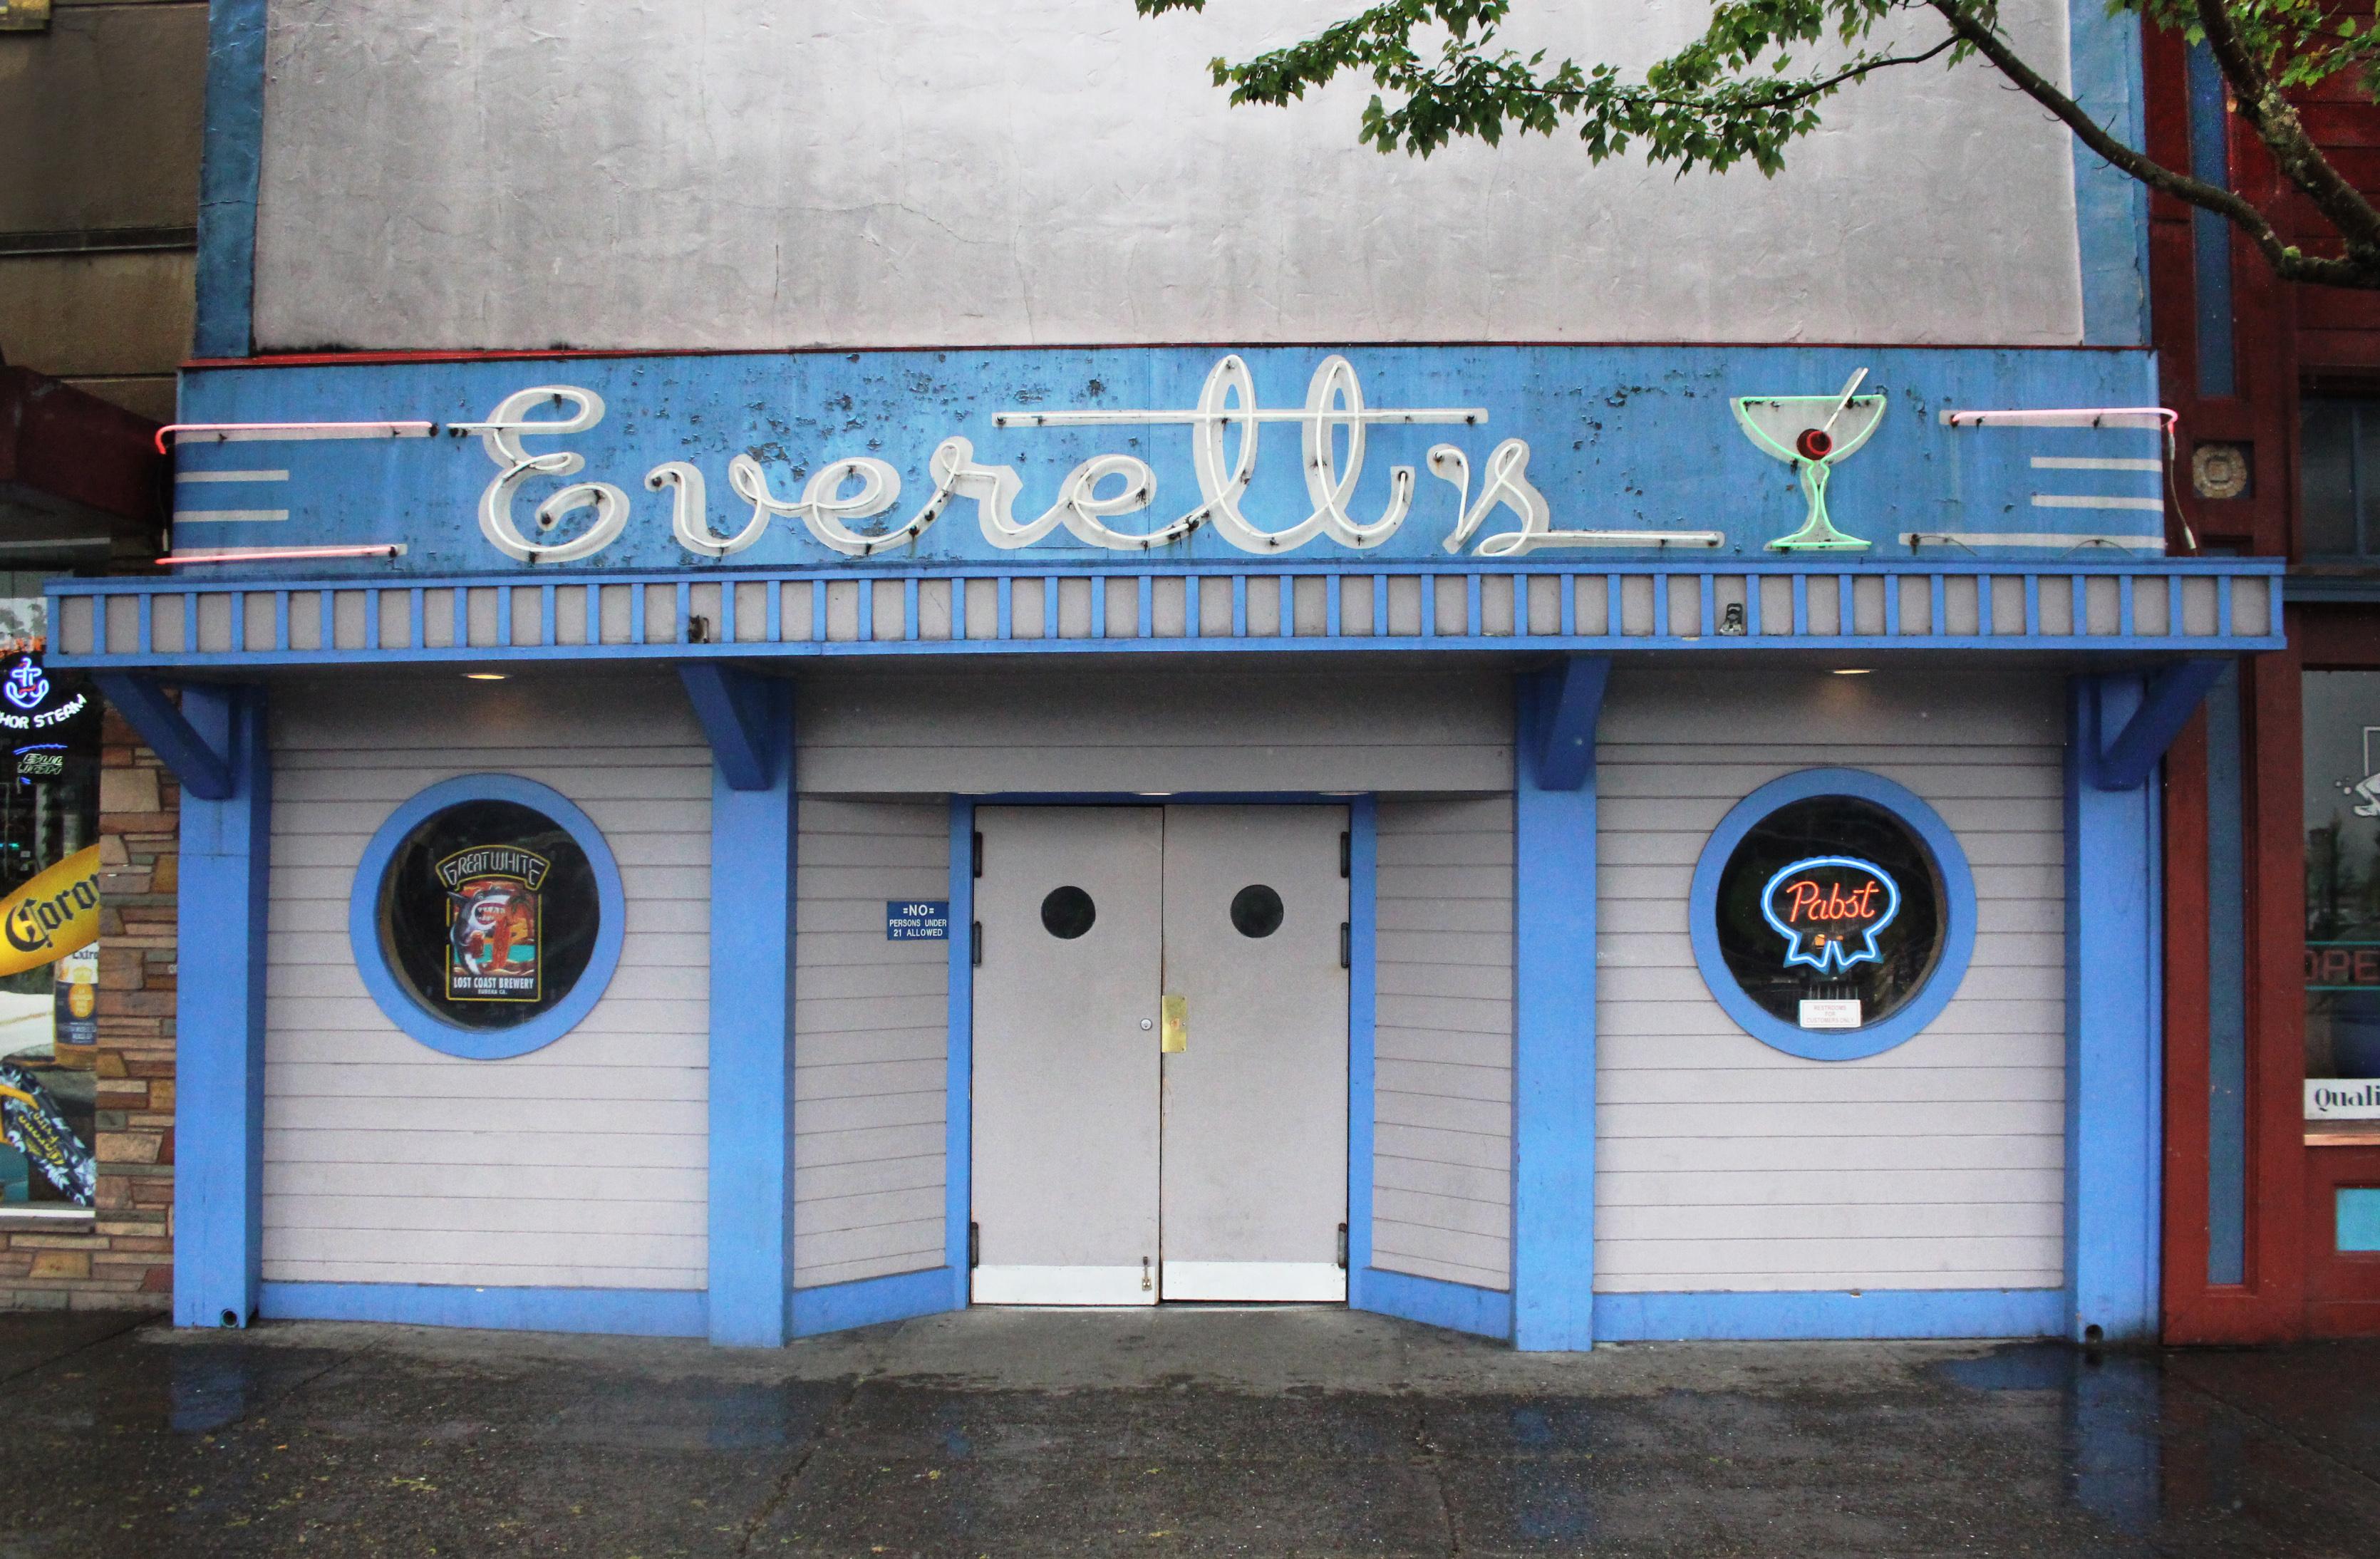 Everett's - 784 9th Street, Arcata, California U.S.A. - May 25, 2018